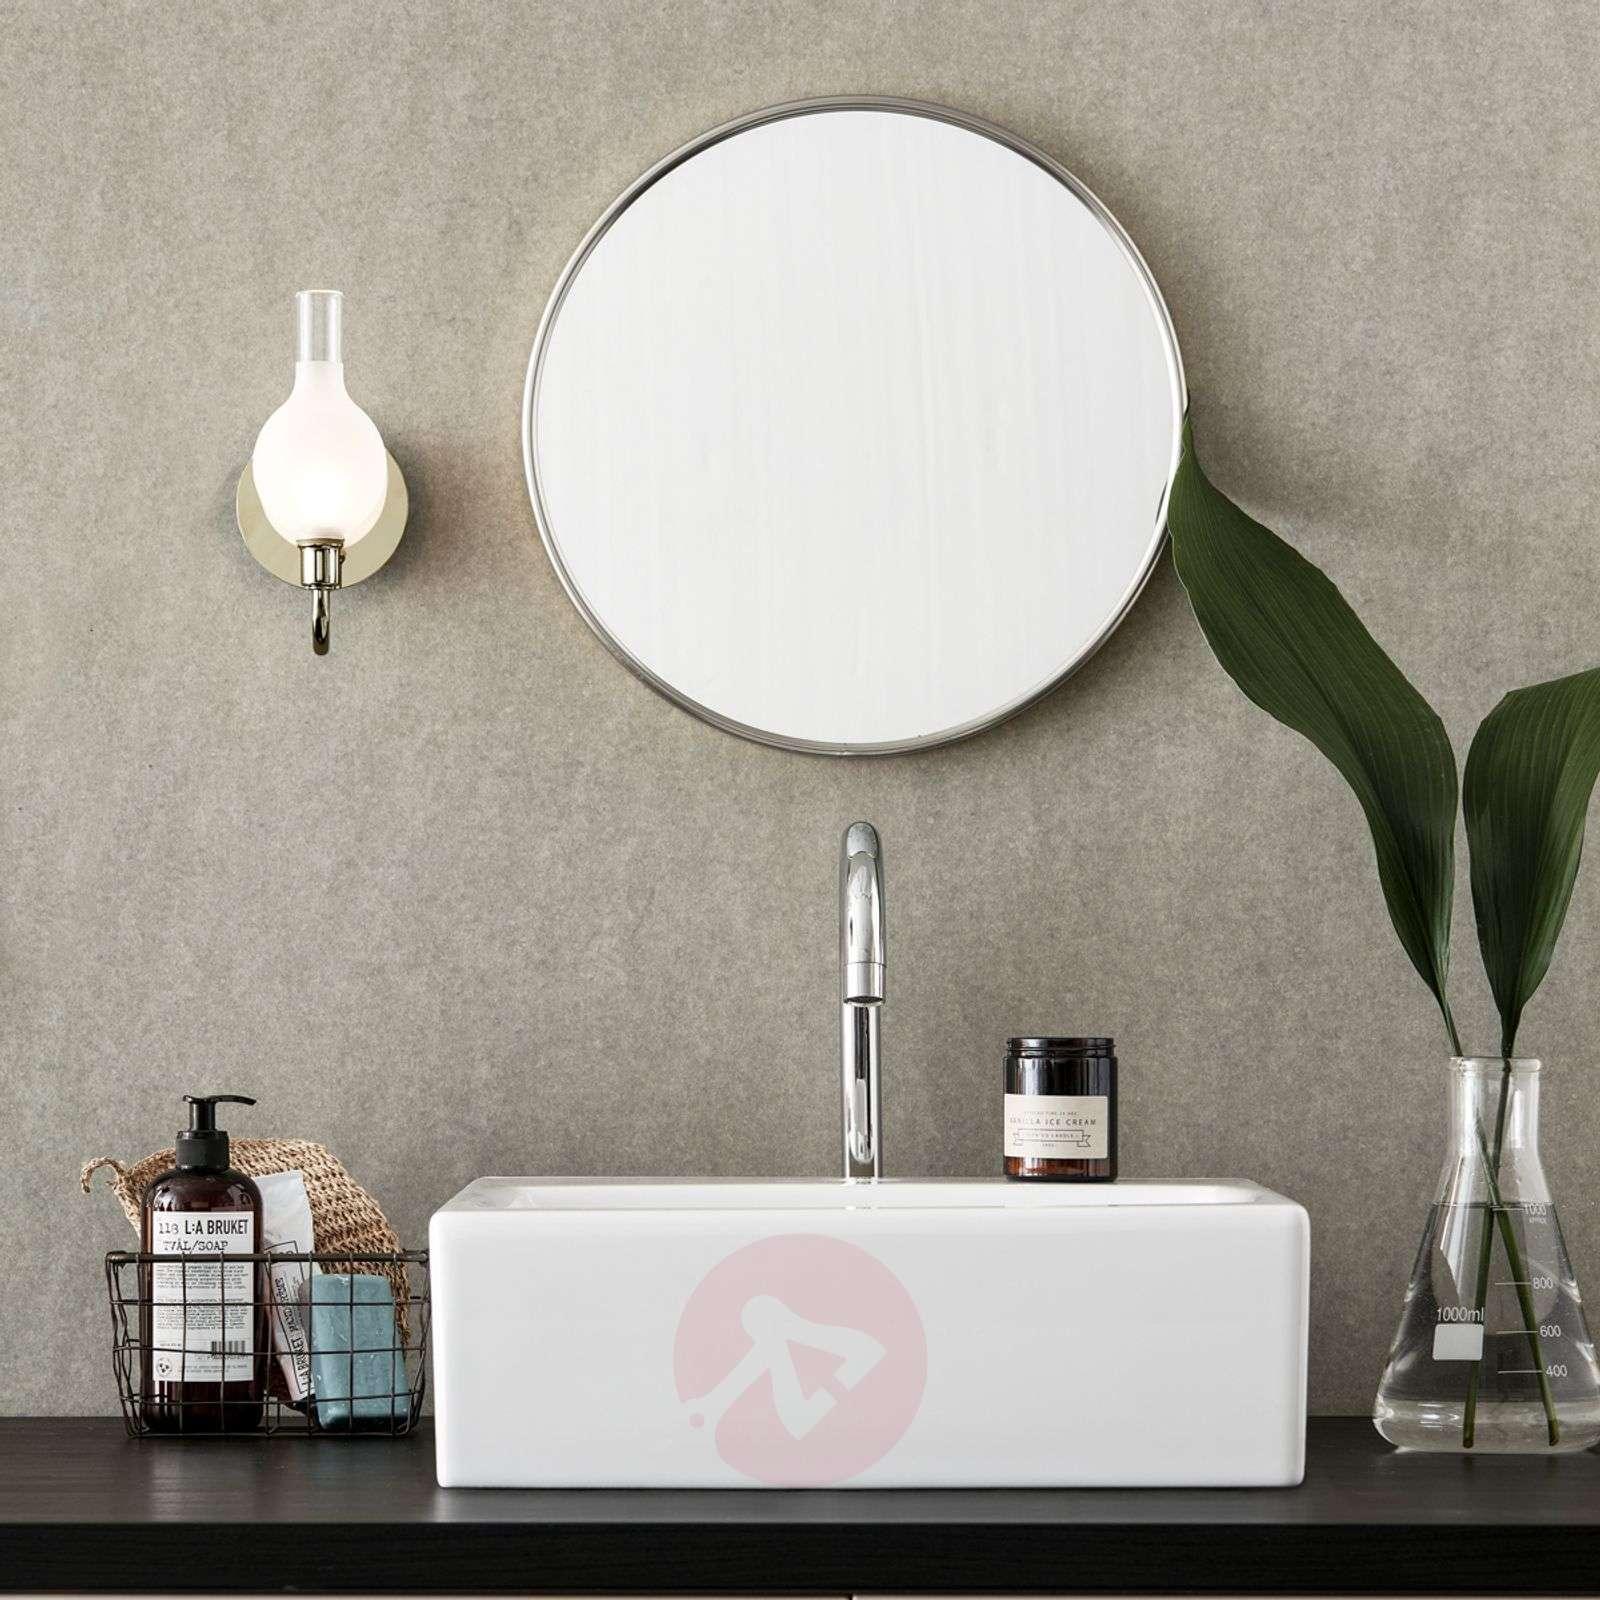 Bathroom wall light Liberty brass-6505629-01